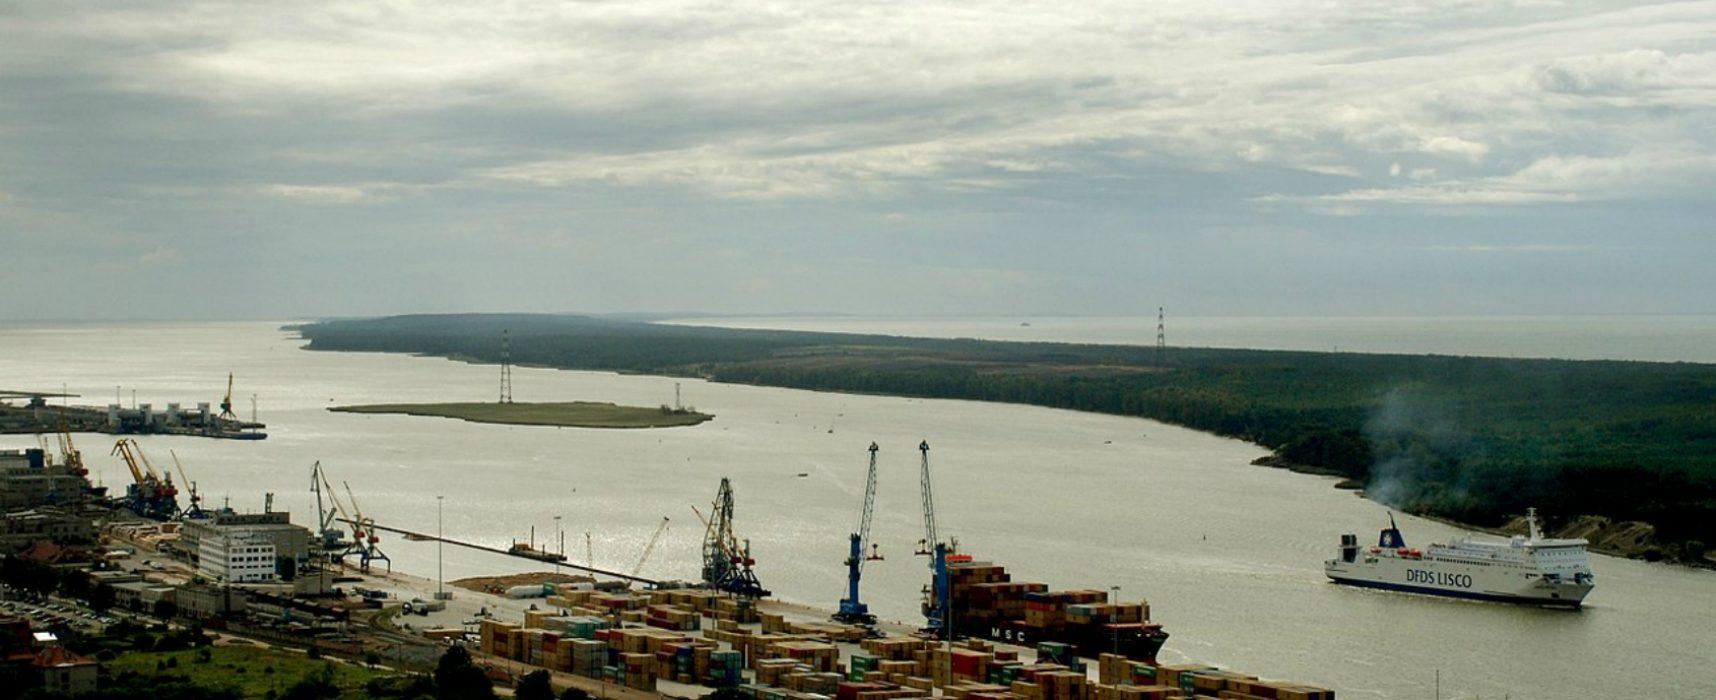 Propaganda targets Baltic energy independence